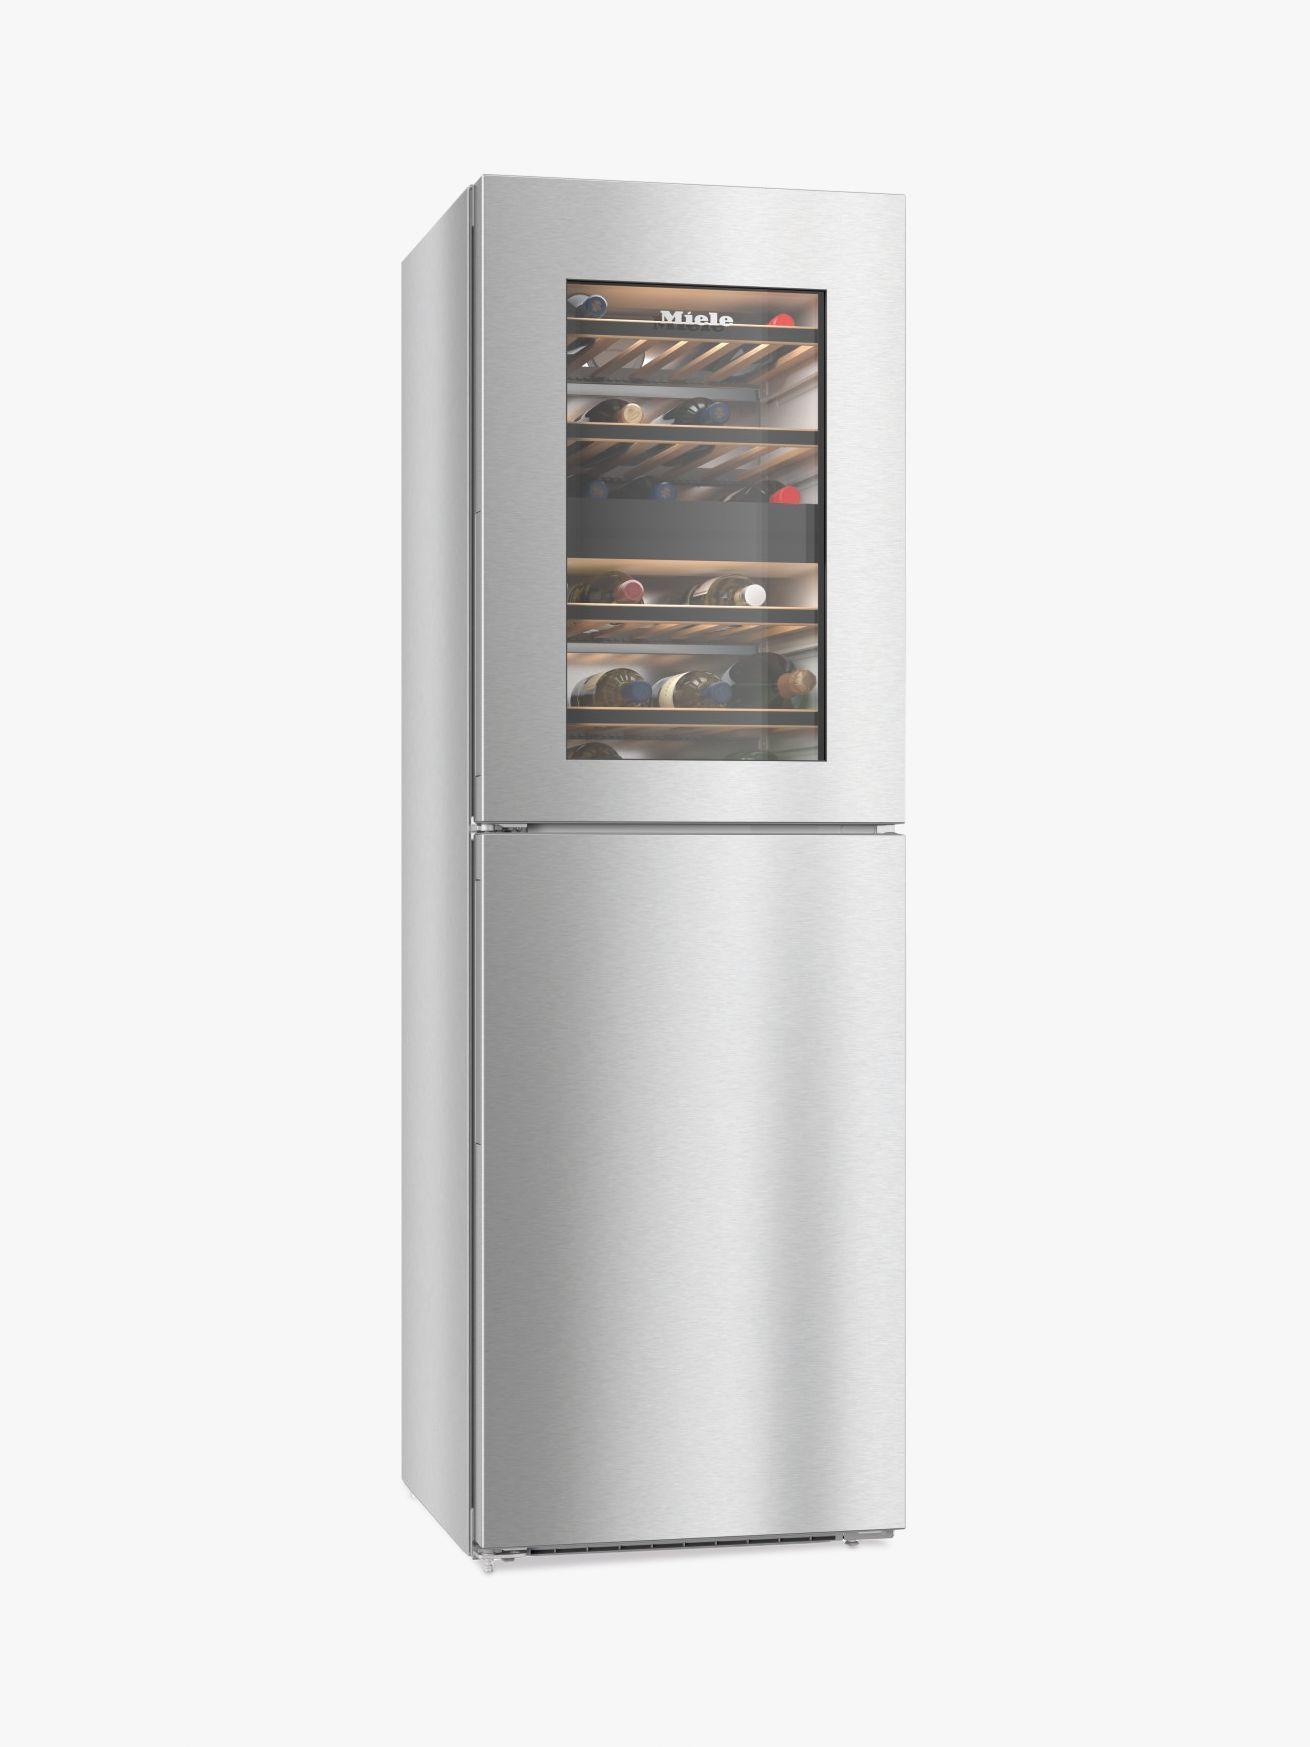 Miele Miele KWNS28462E Freestanding Fridge Freezer, A++ Energy Rating, Silver